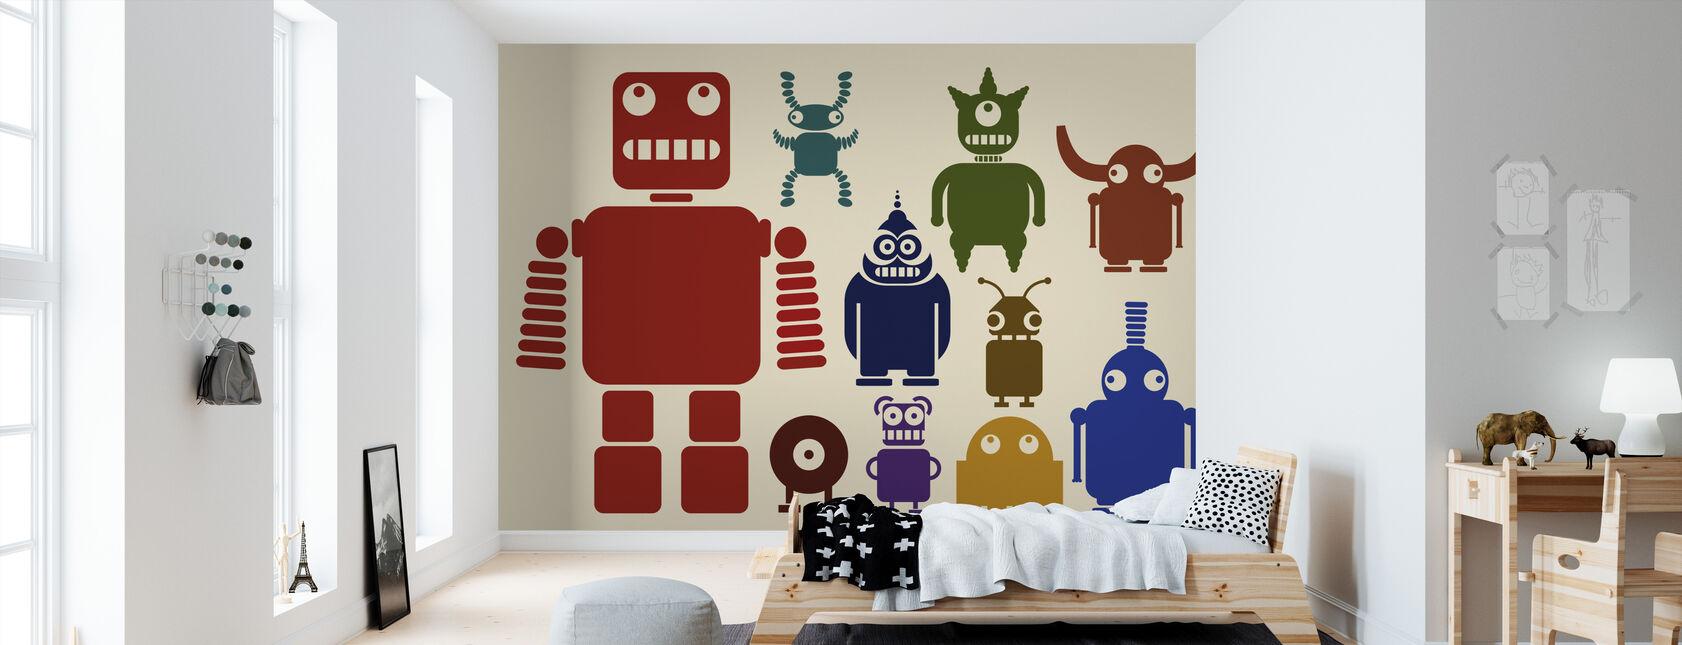 Robotit ja kyborgit